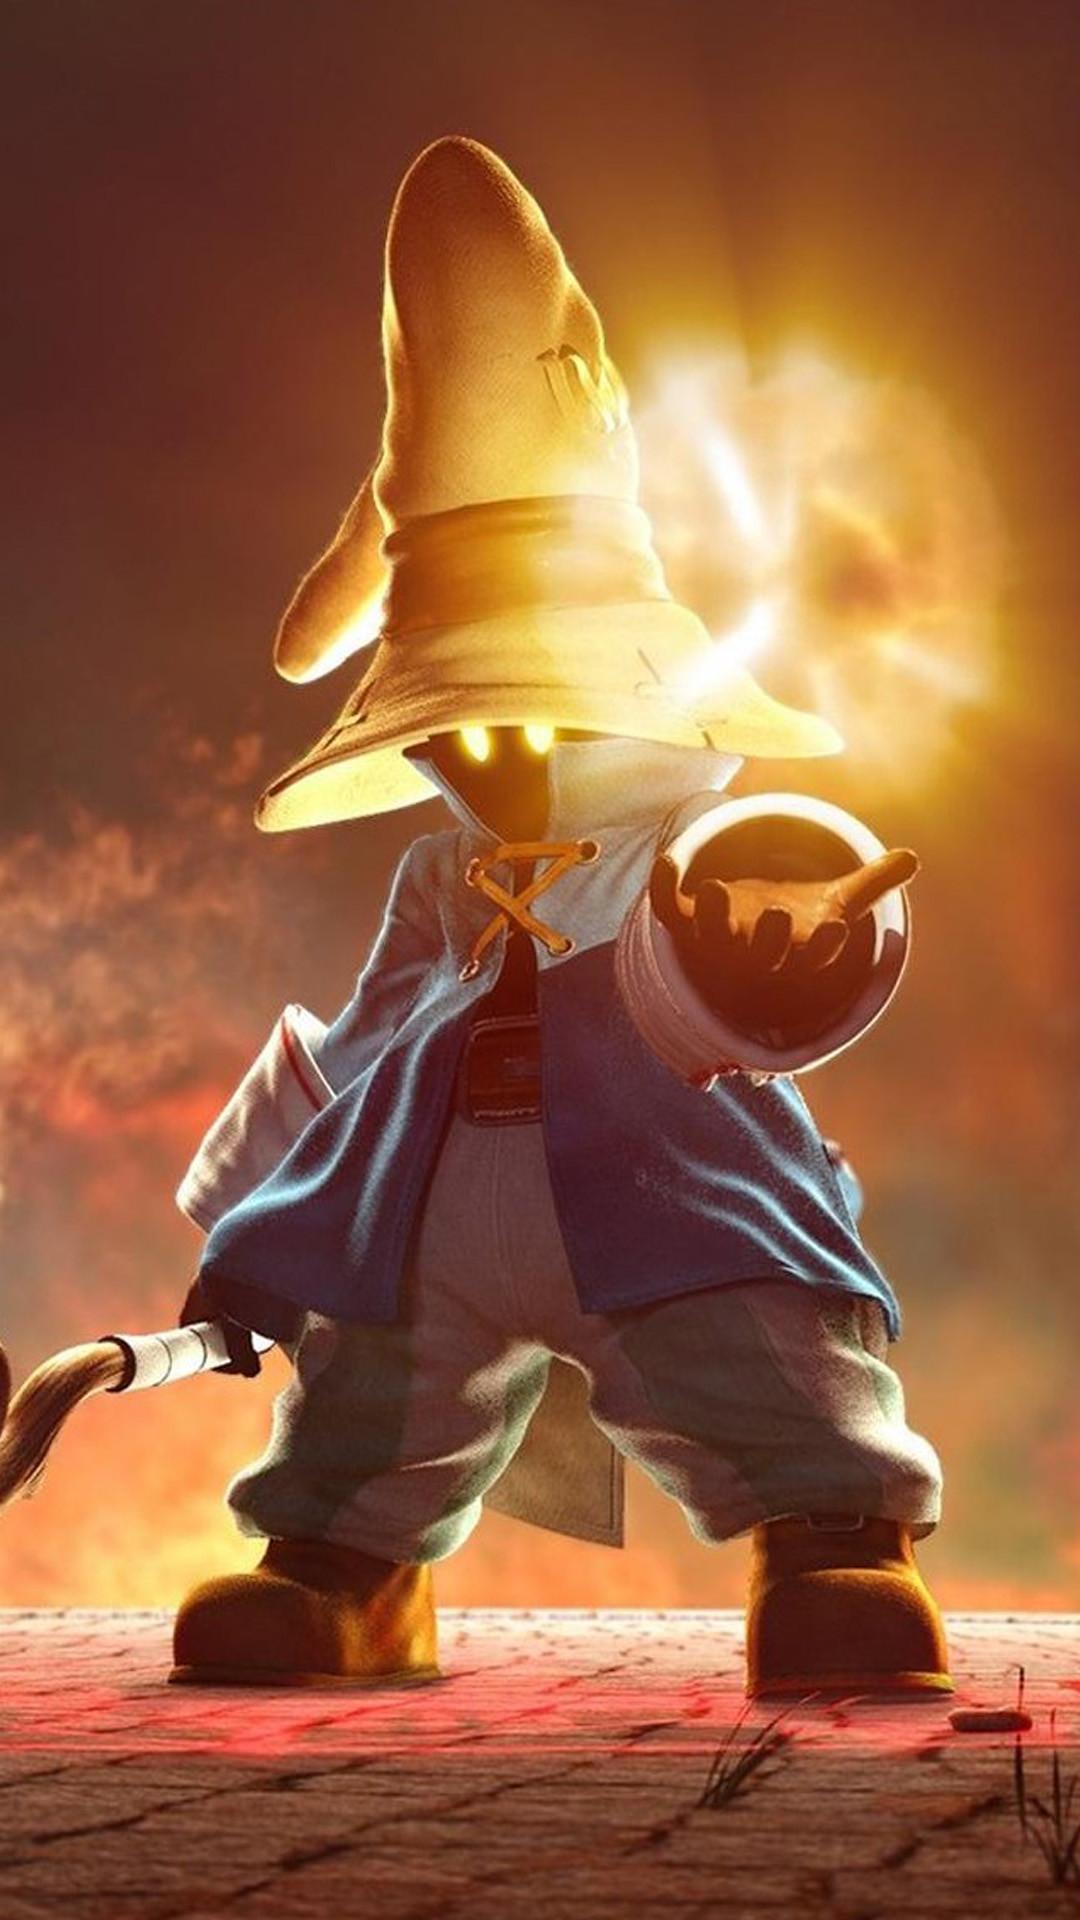 """Vivi Final Render"" by John Lozano // Final Fantasy IX"